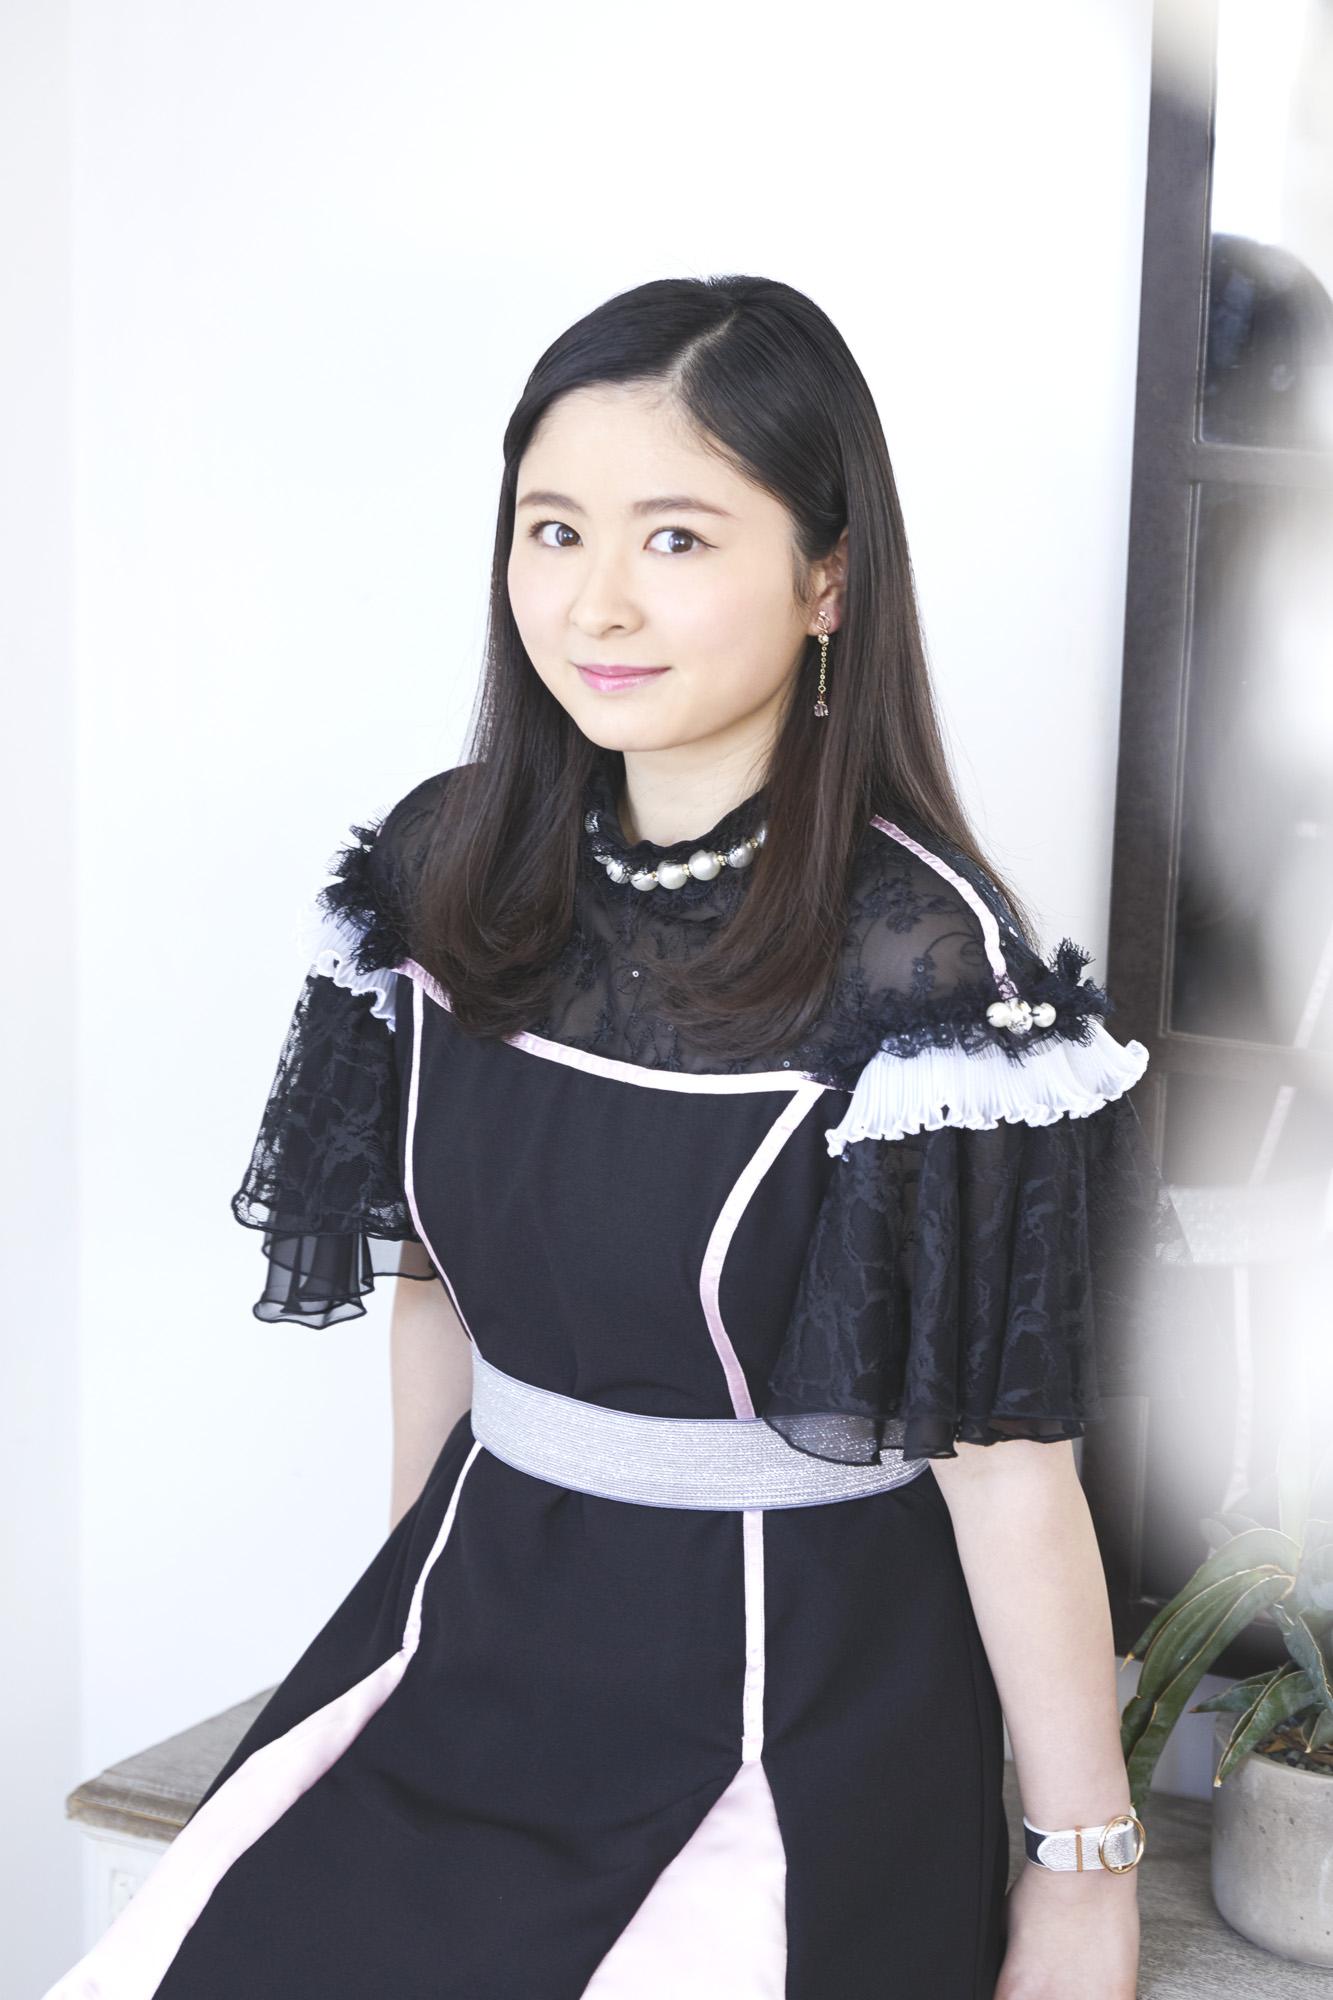 【JIN生誕祭アフターパーティ】RY's定期公演